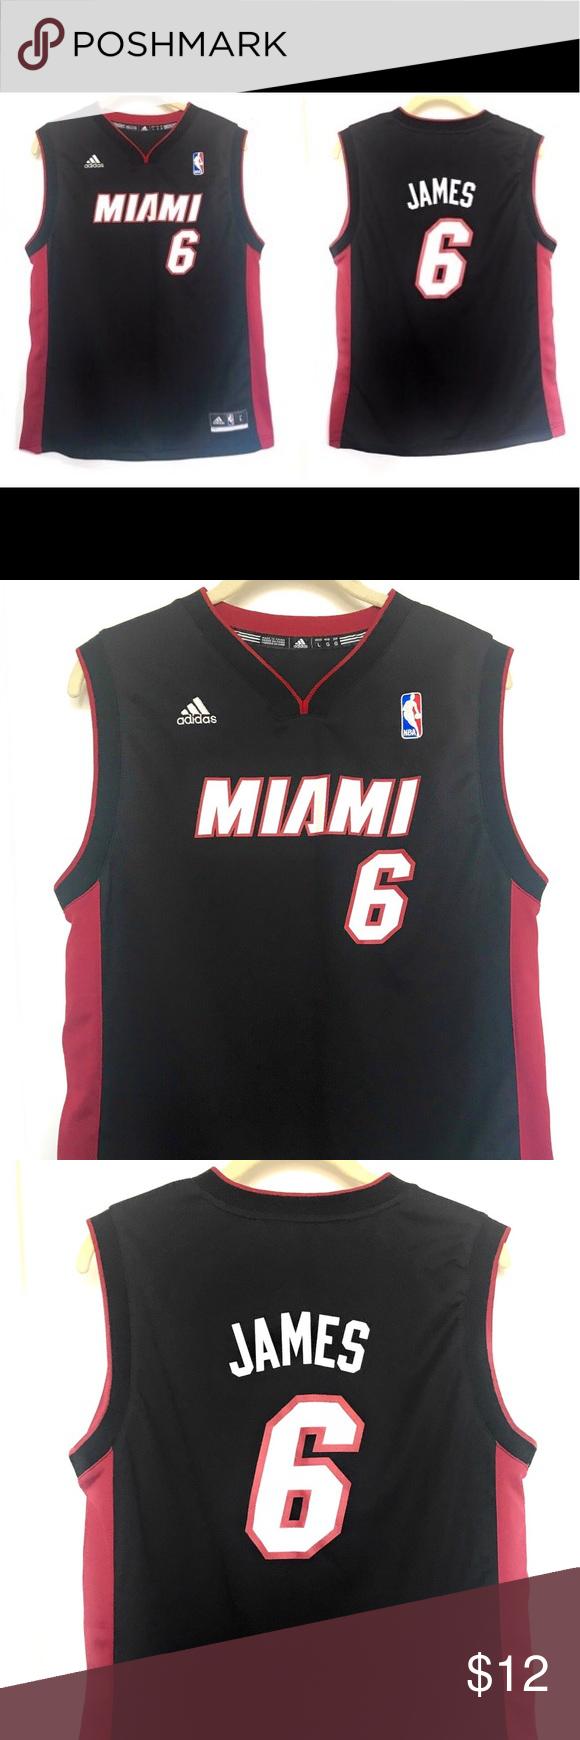 Miami Heat Lebron James Boys Jersey Lebron James Kids Adidas Shirt Lebron James